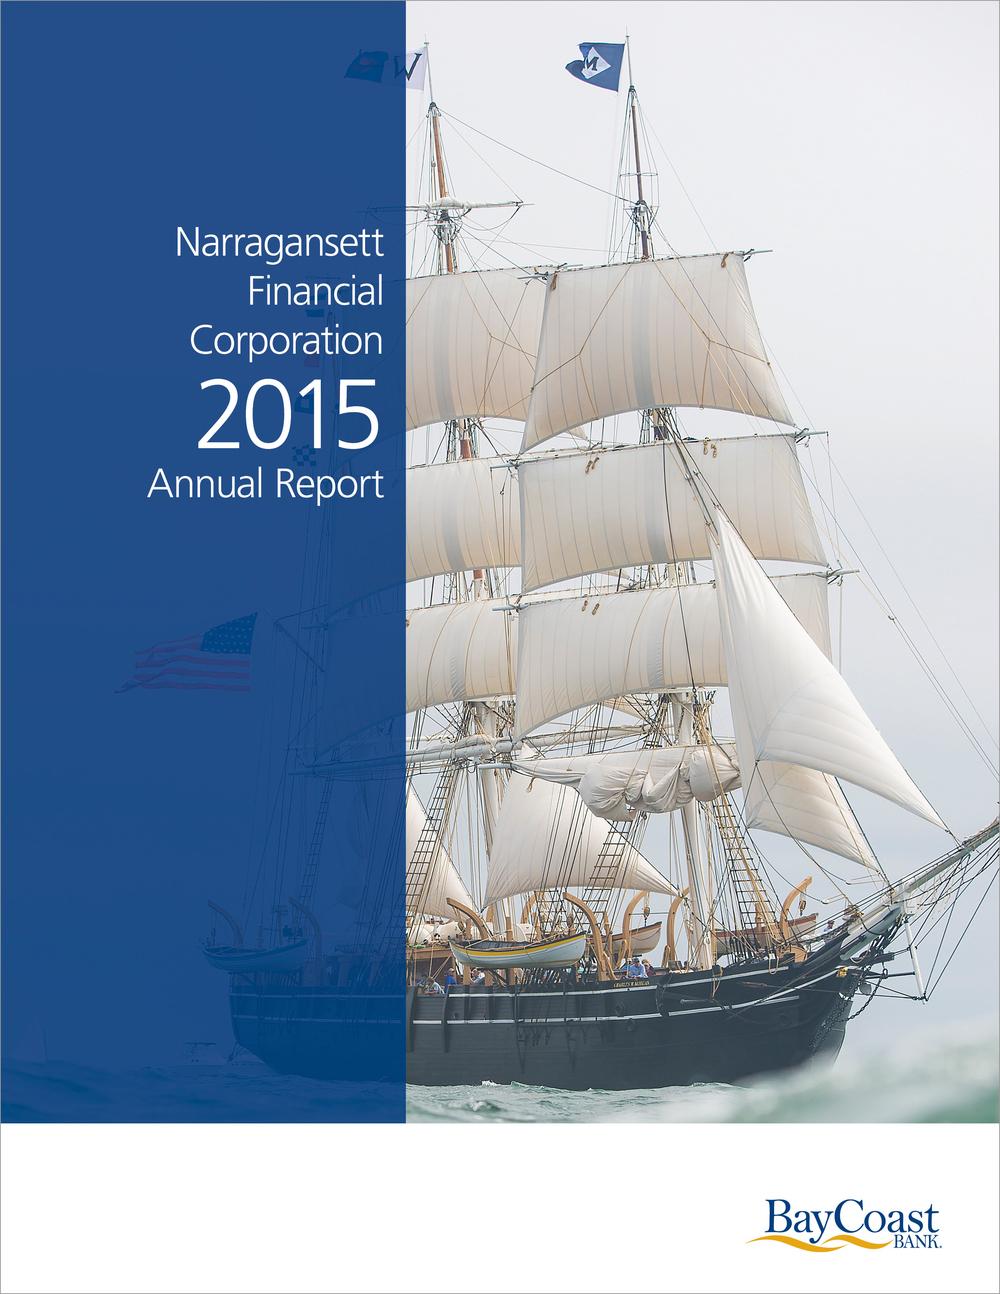 BayCoast Bank 2015 Annual Report